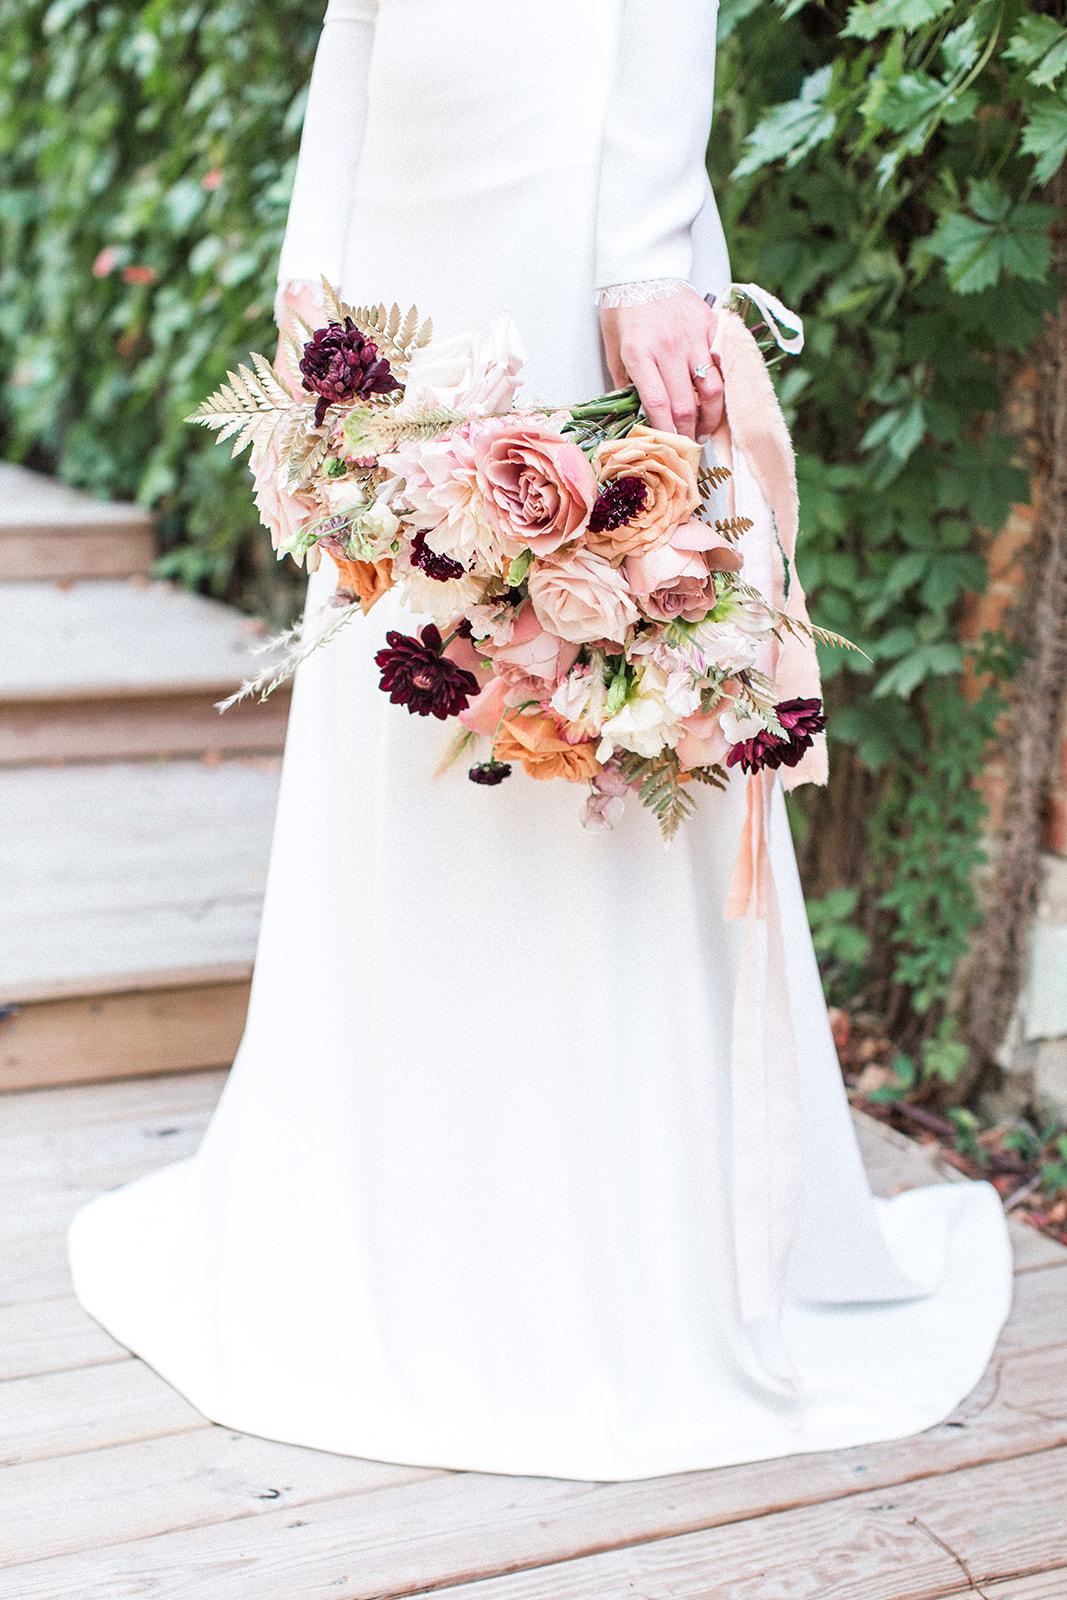 Feminine wedding bouquet design: Fall Garden Wedding featured on Alexa Kay Events